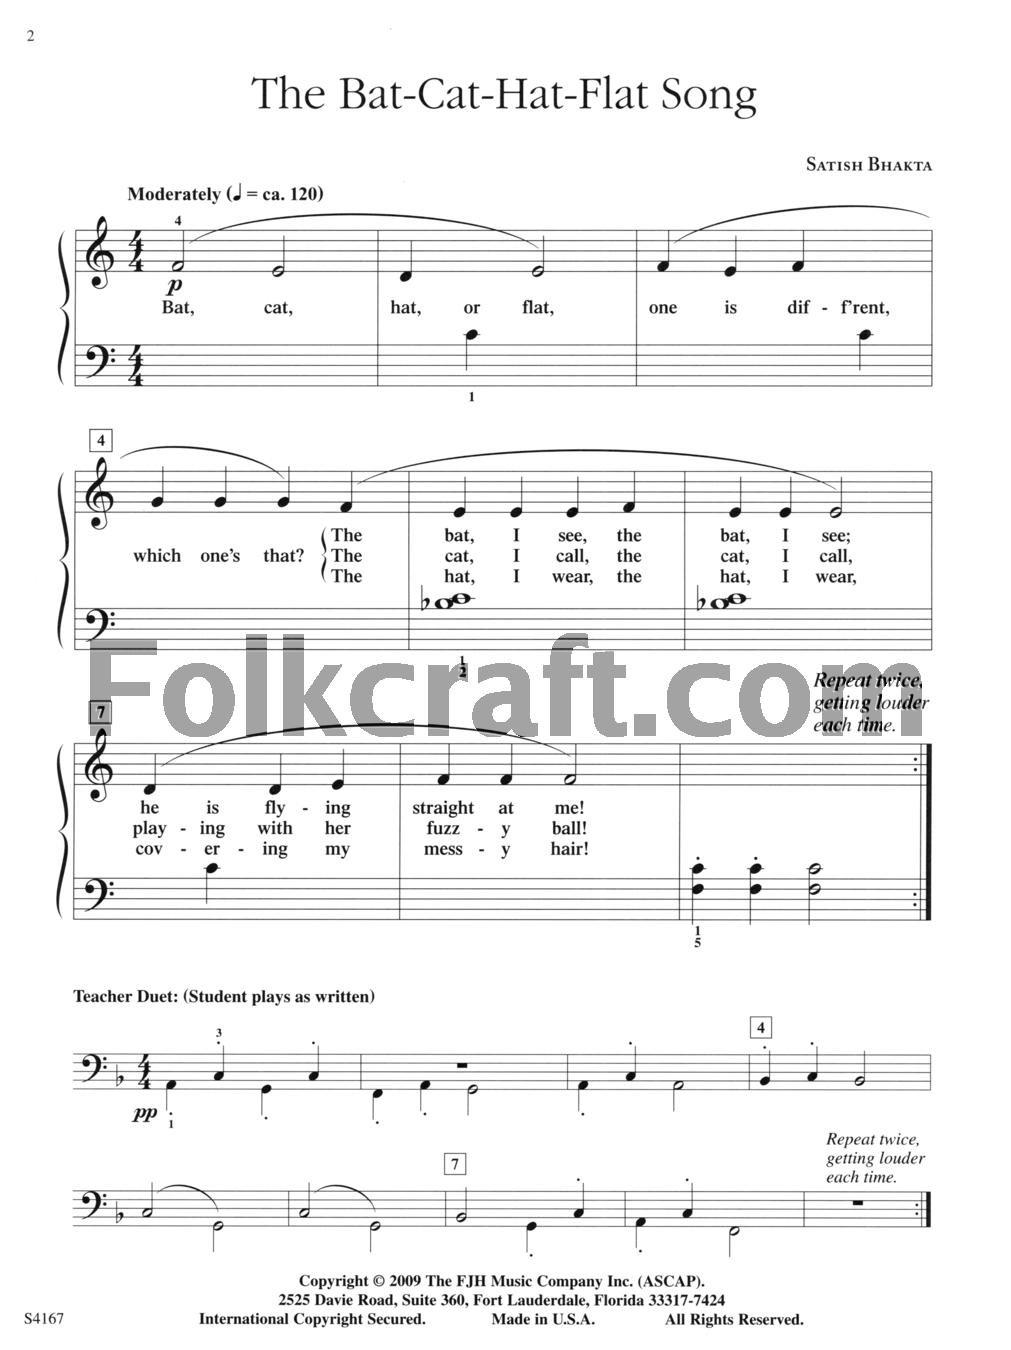 06b16f97 Satish Bhakta - The Bat-Cat-Hat-Flat Song: 0674398225279: Amazon.com:  Musical Instruments